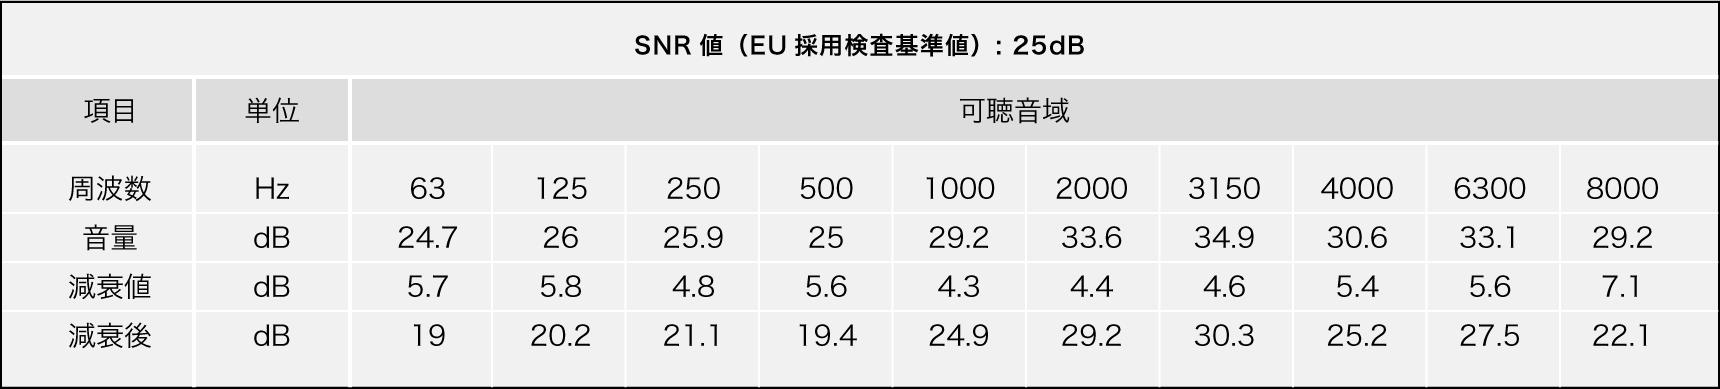 SNR値(EU採用検査基準値): 25dB